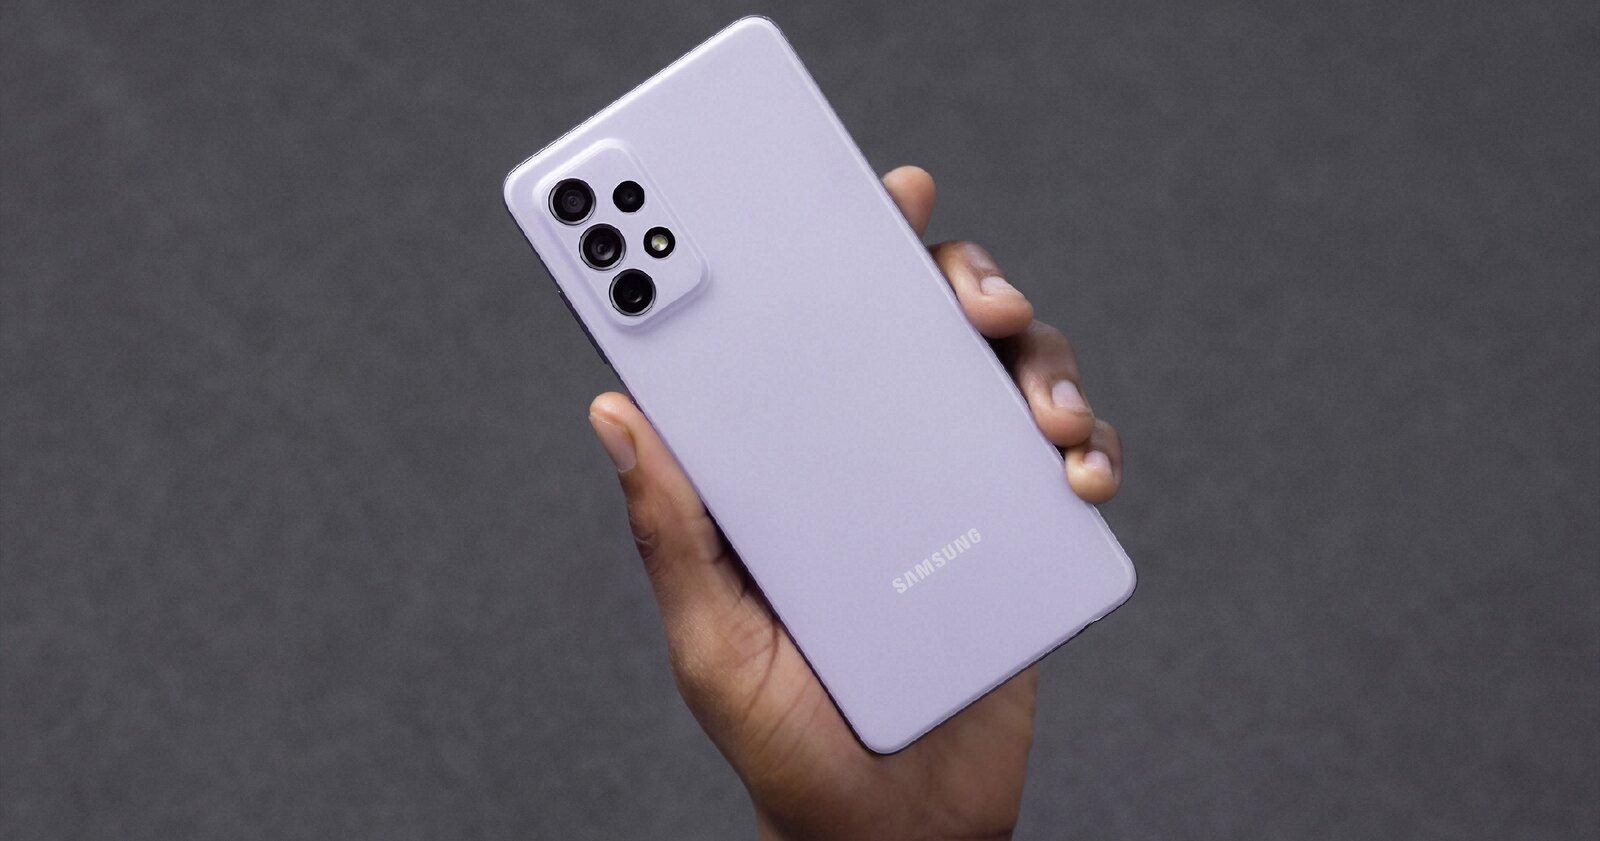 Samsung Galaxy A52 violet, arrière